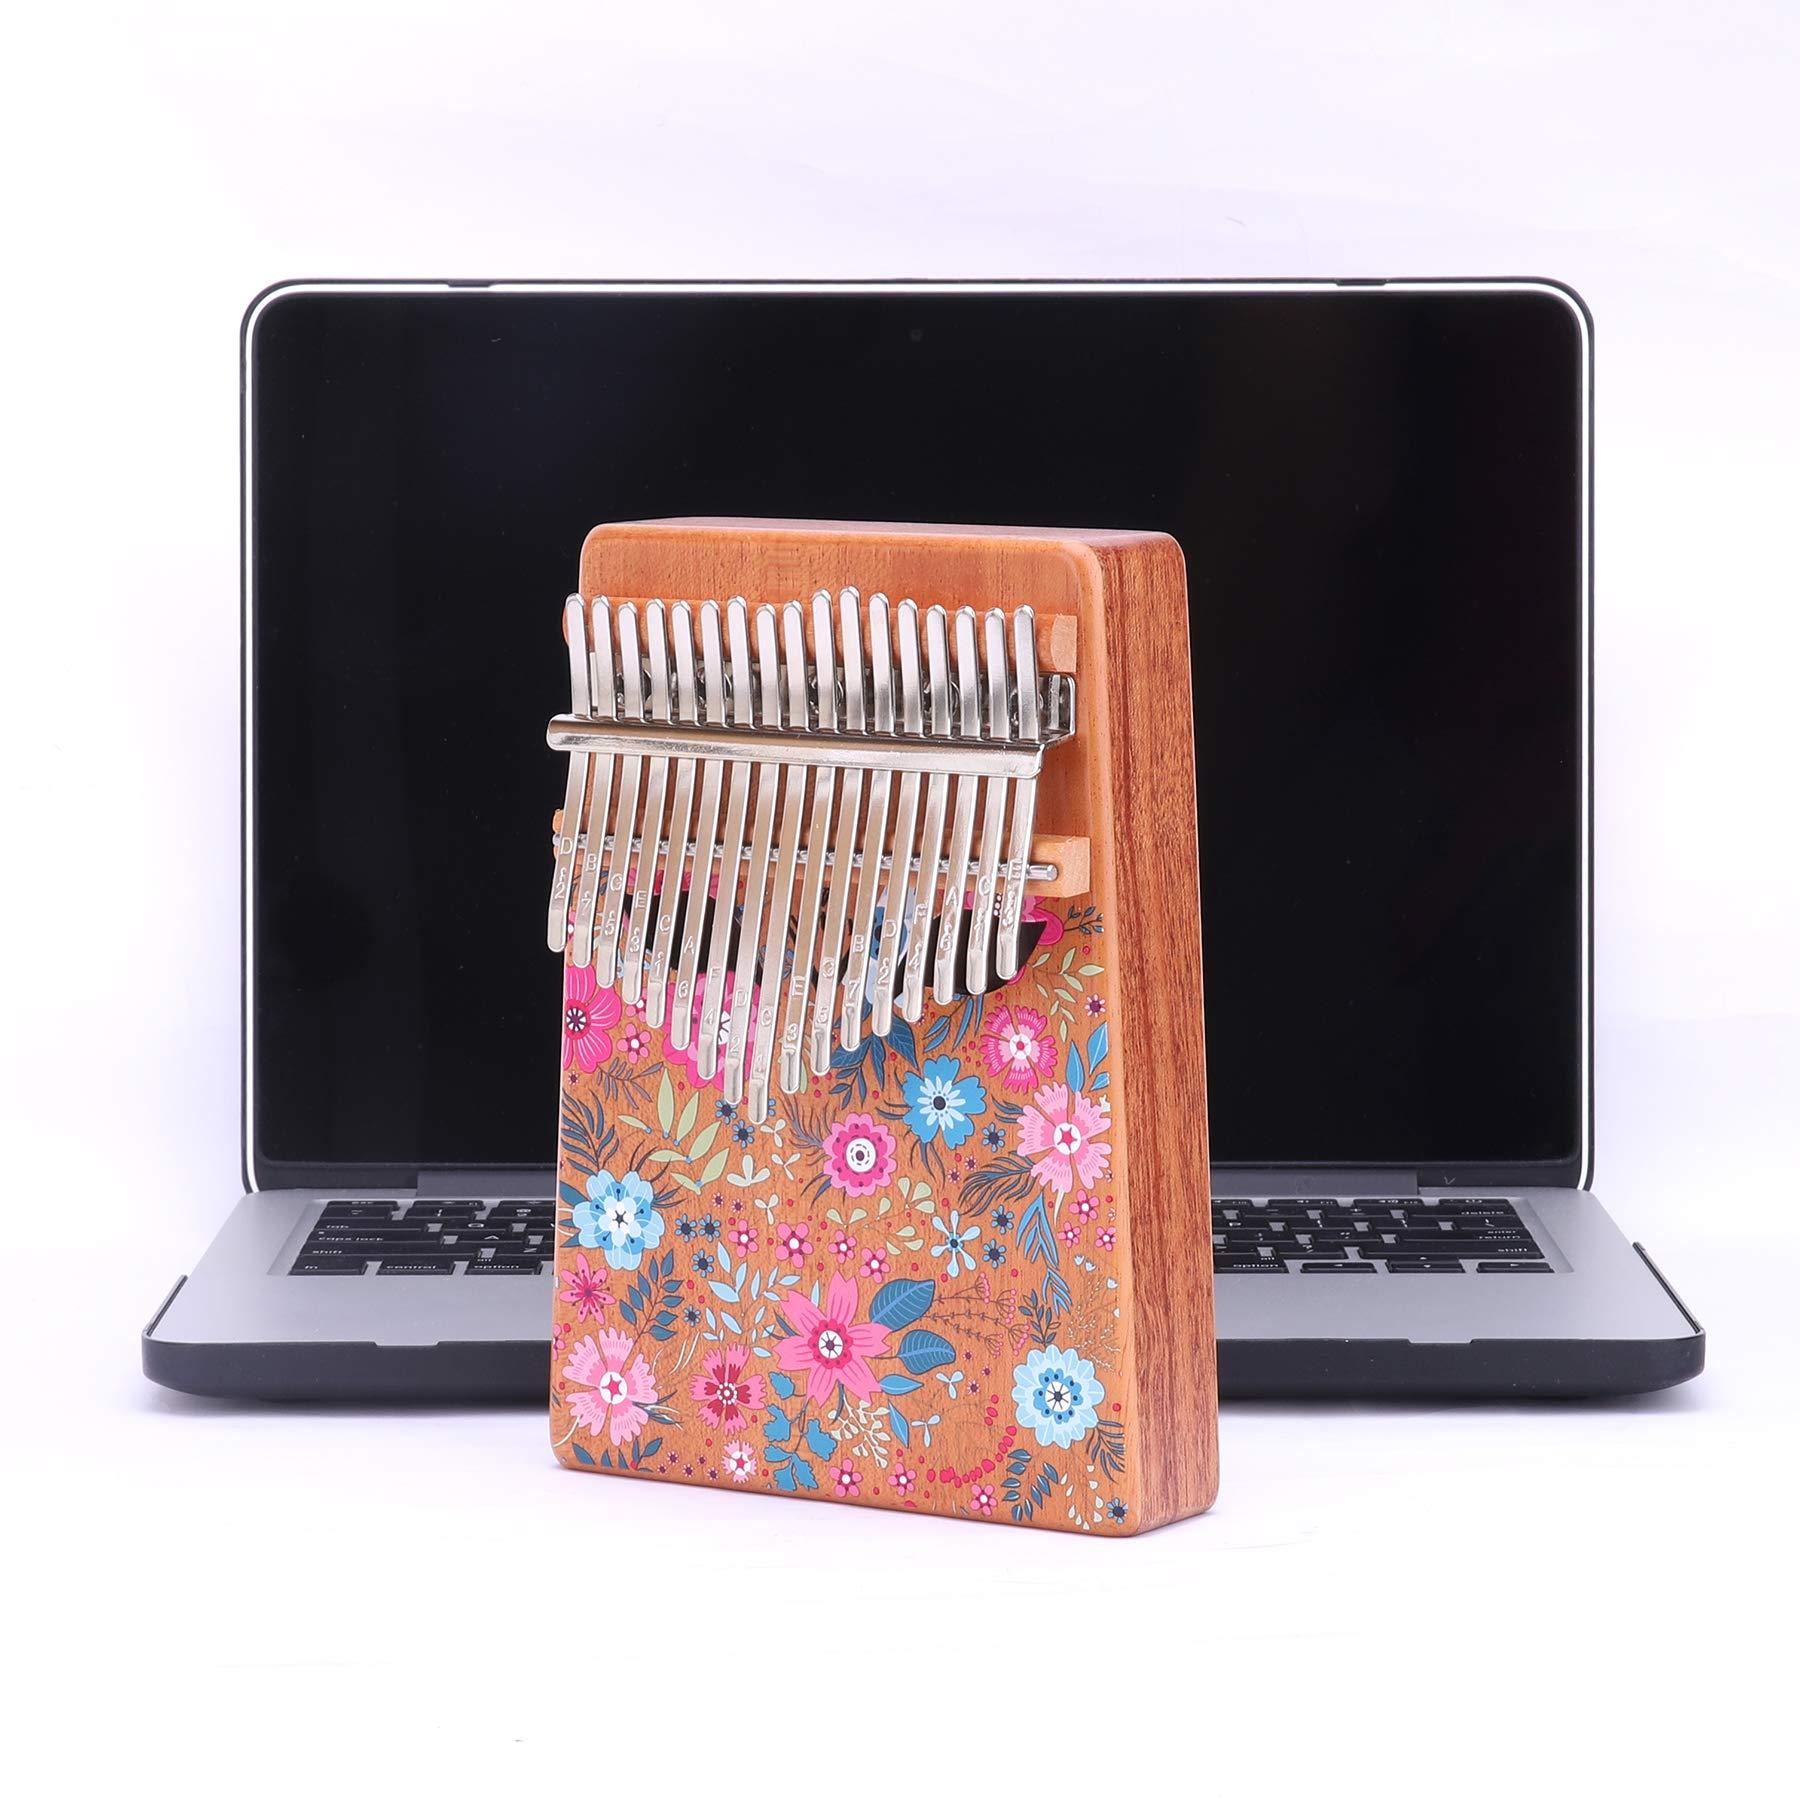 VI VICTORY 17 Key 3D Painted Kalimba African Thumb Piano Finger Percussion Keyboard Music Instruments - Sakura 2 by VI VICTORY (Image #2)